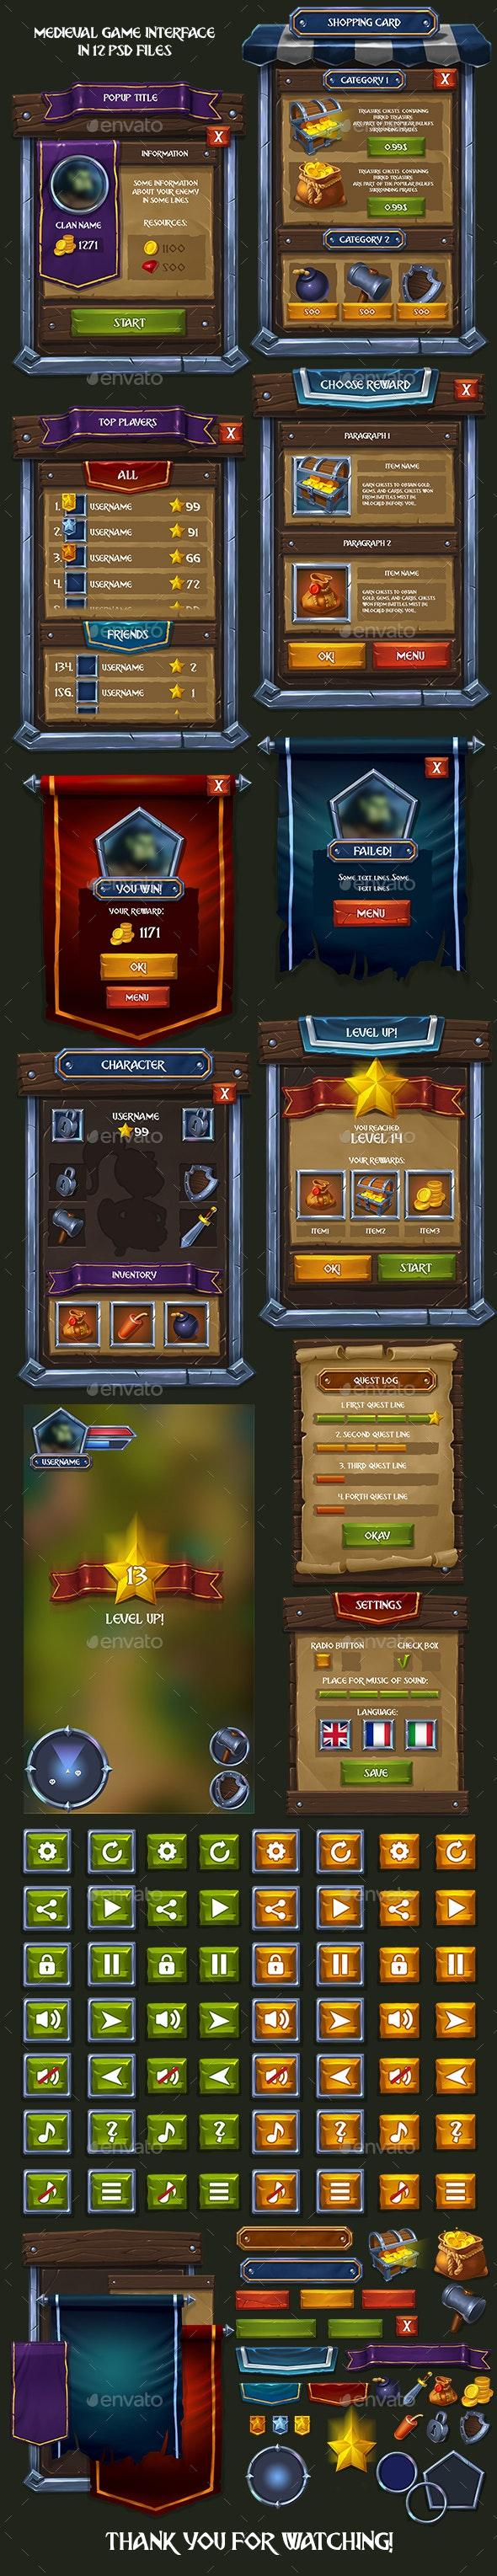 Medieval RPG Game Interface